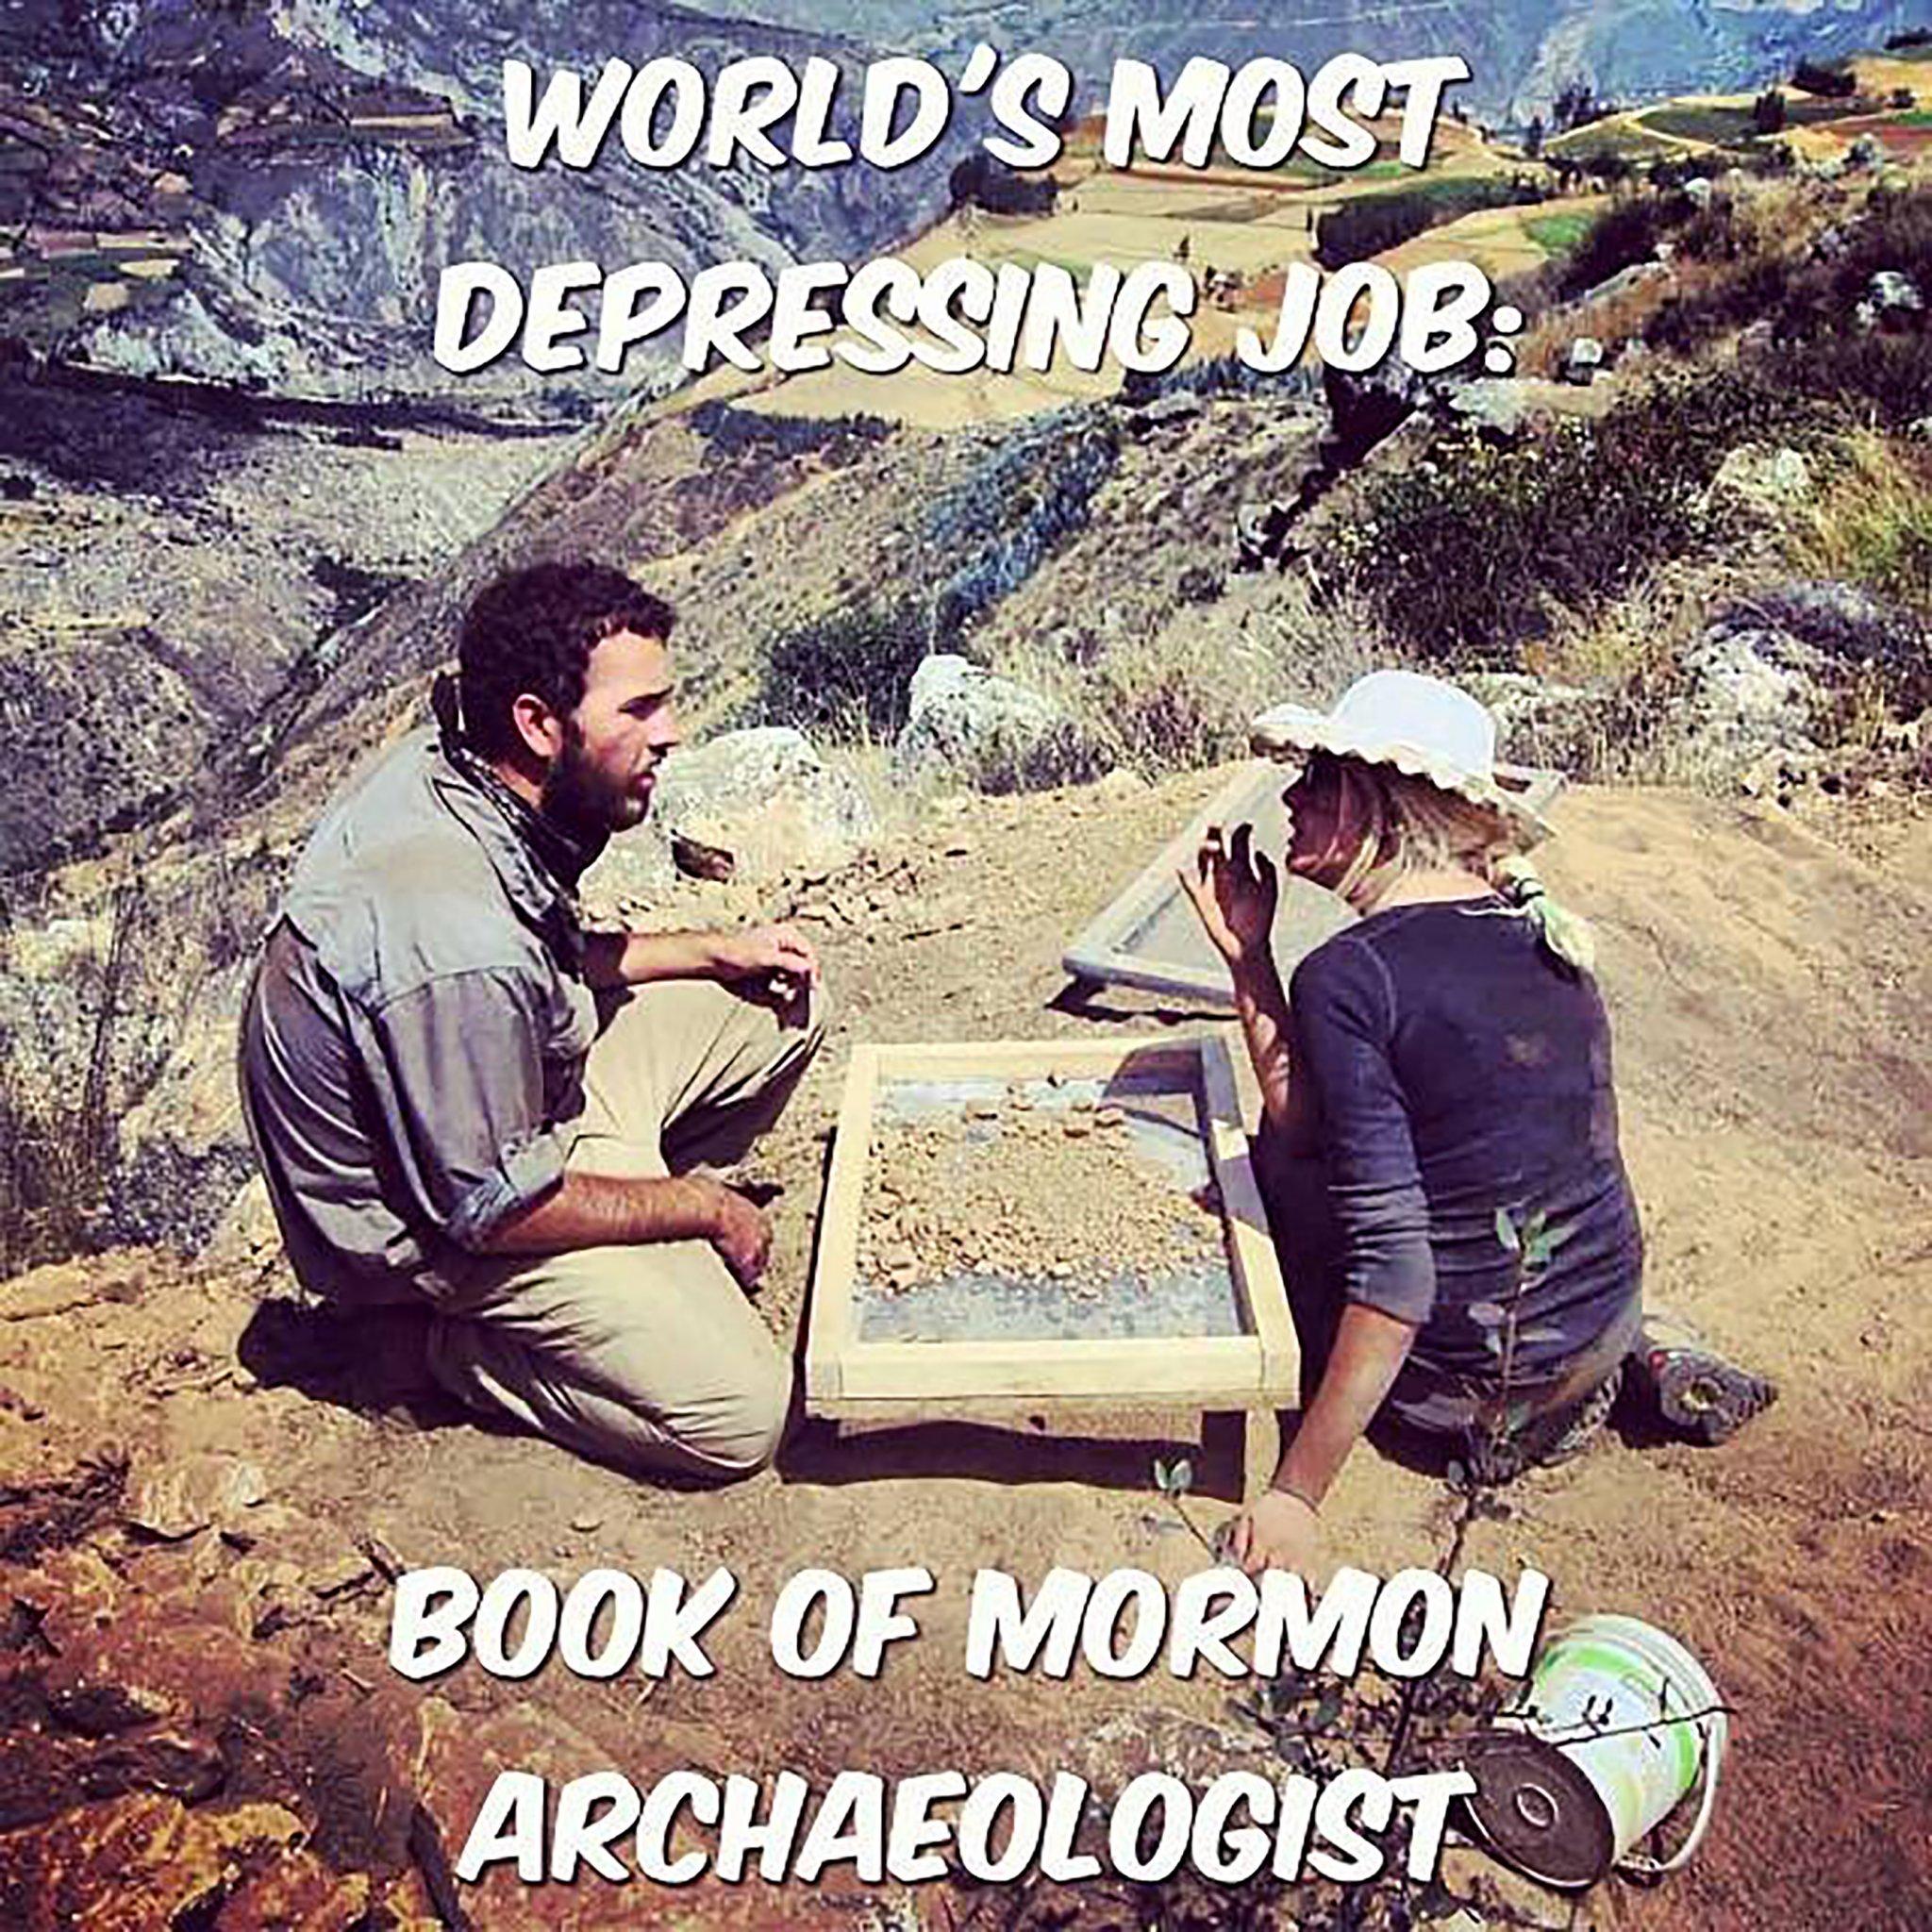 Archaeologist .jpg